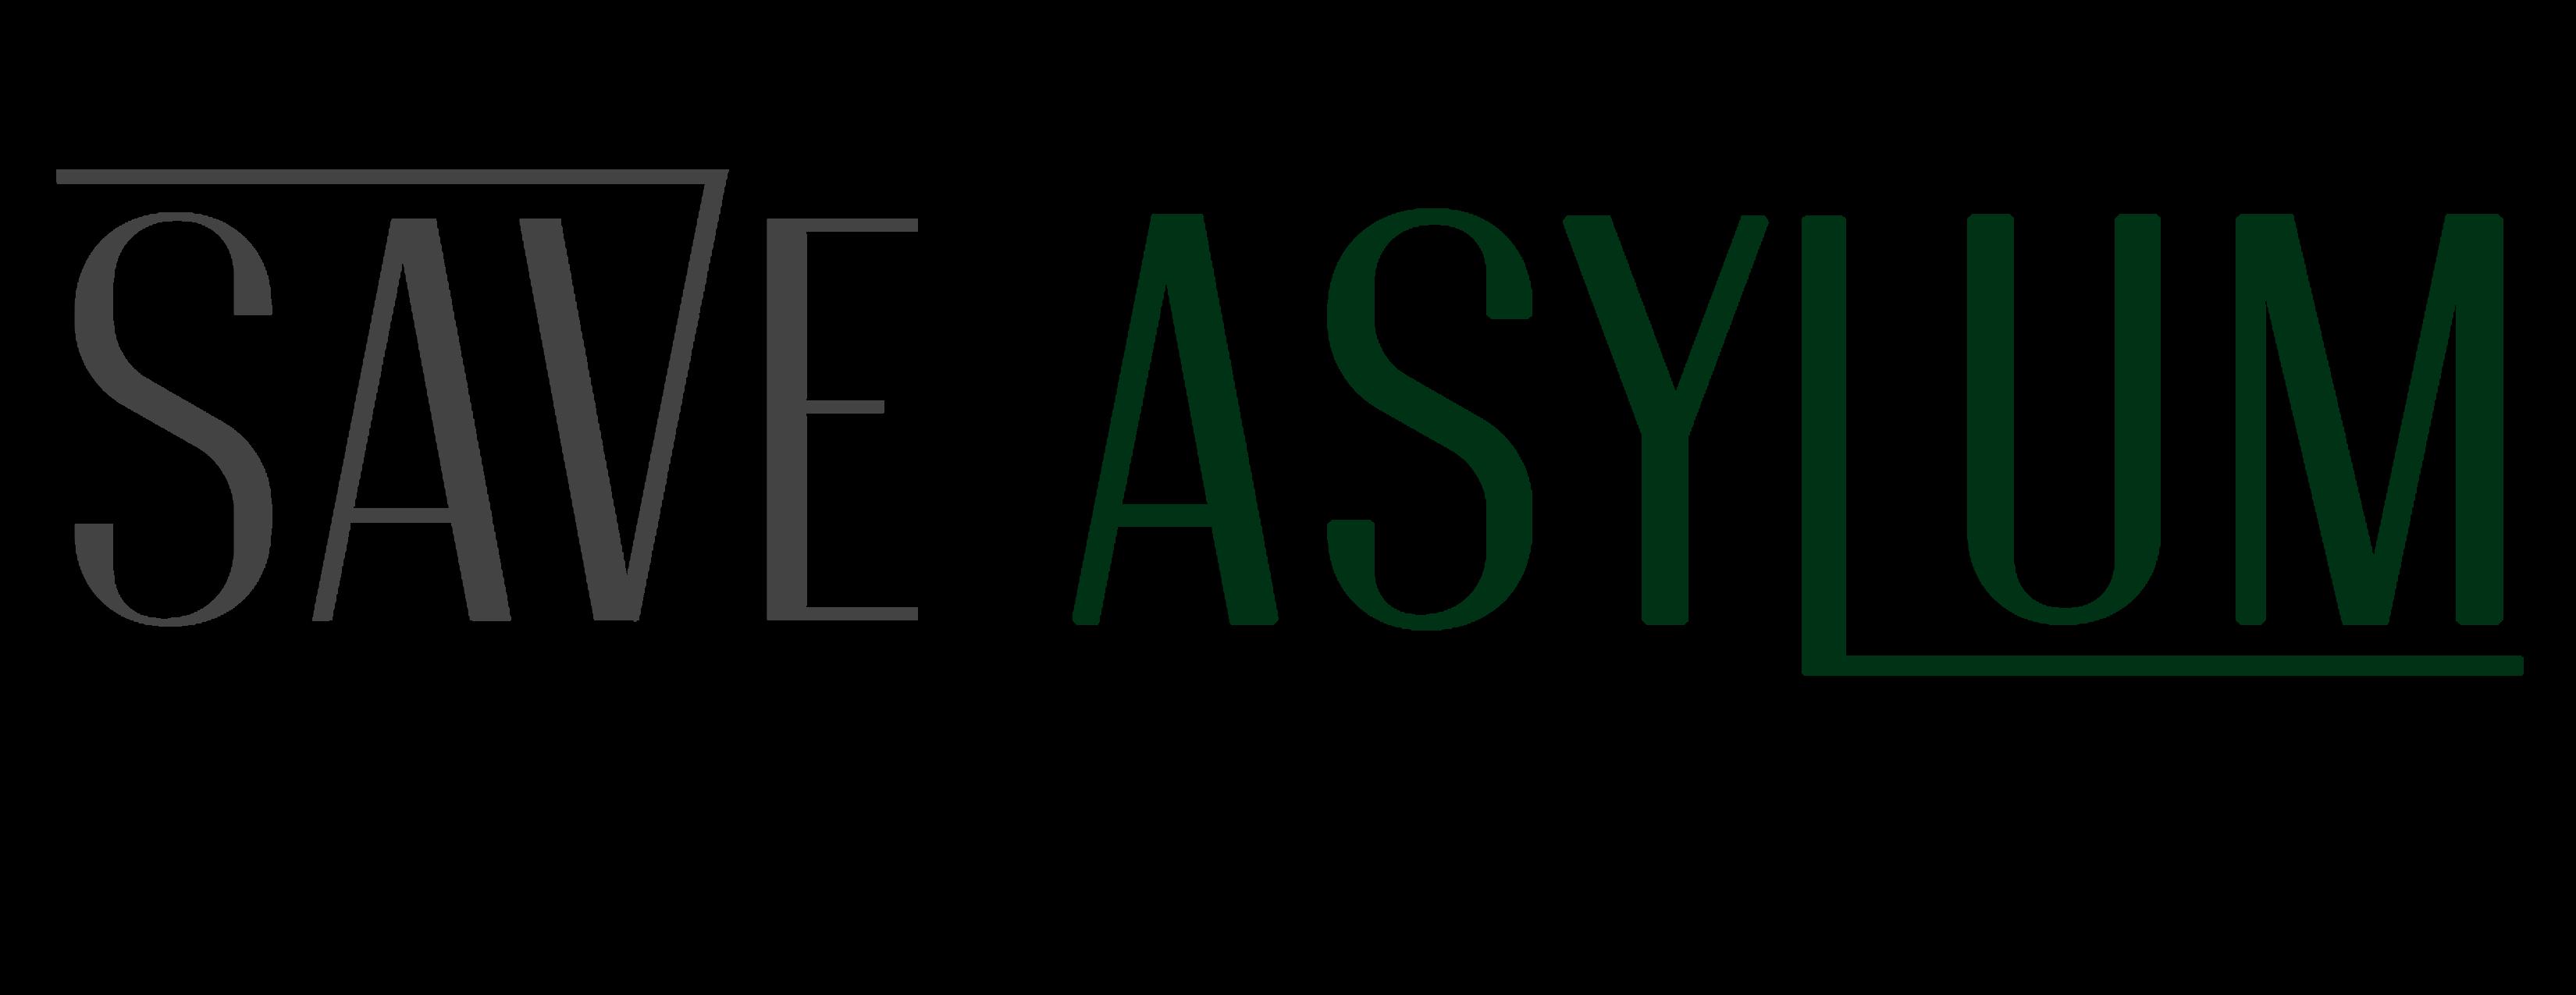 Save Asylum in USA